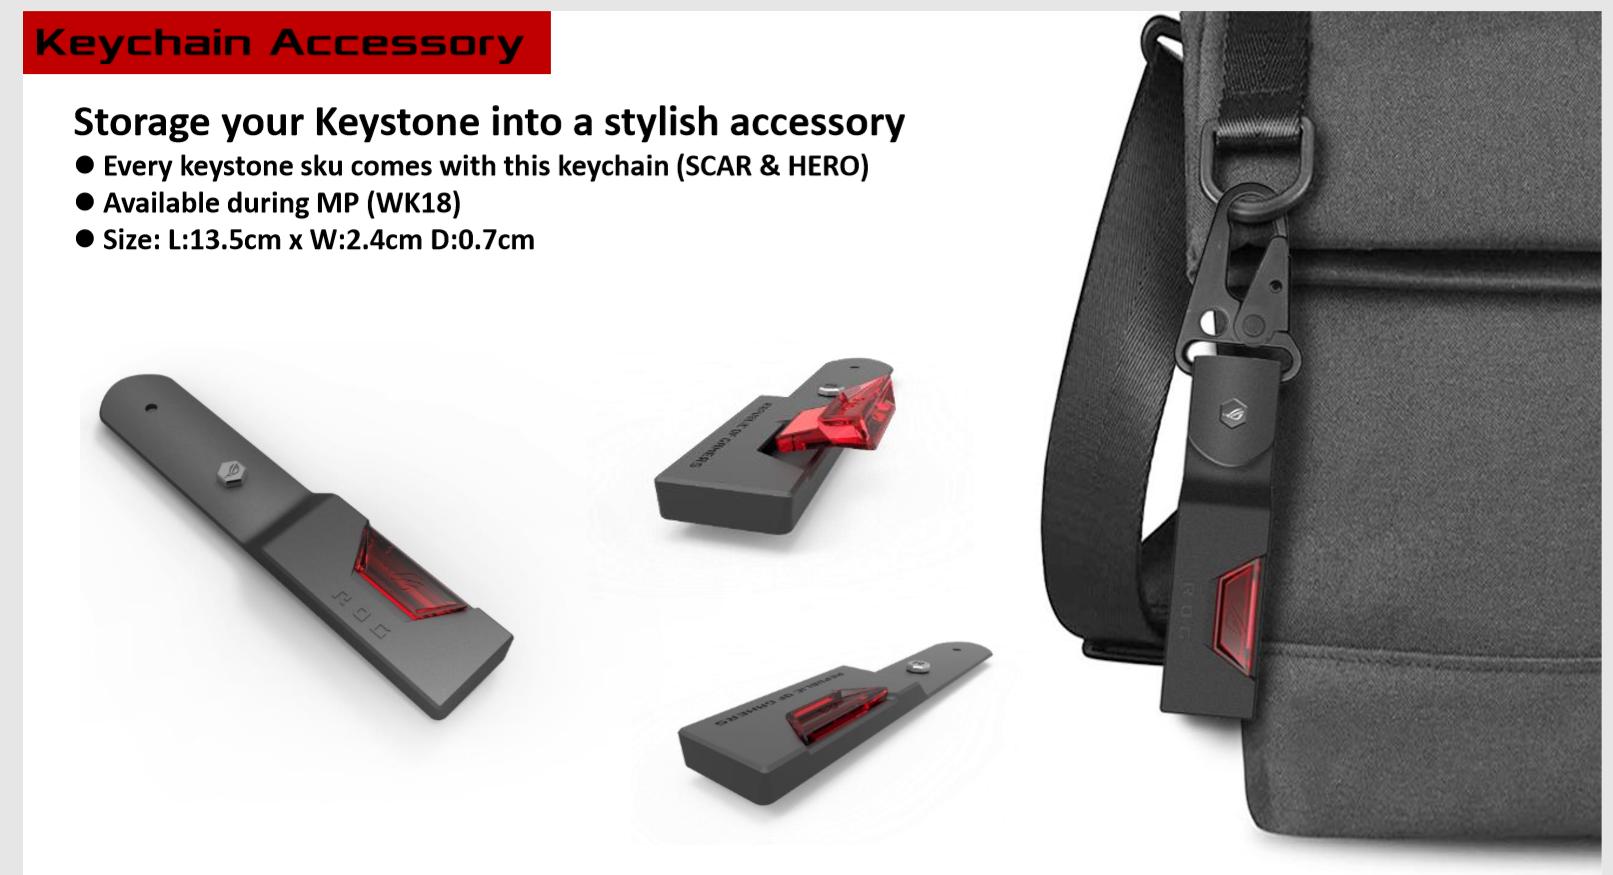 Asus ROG Strix Scar III: Tiêu chuẩn mới của Laptop Gaming